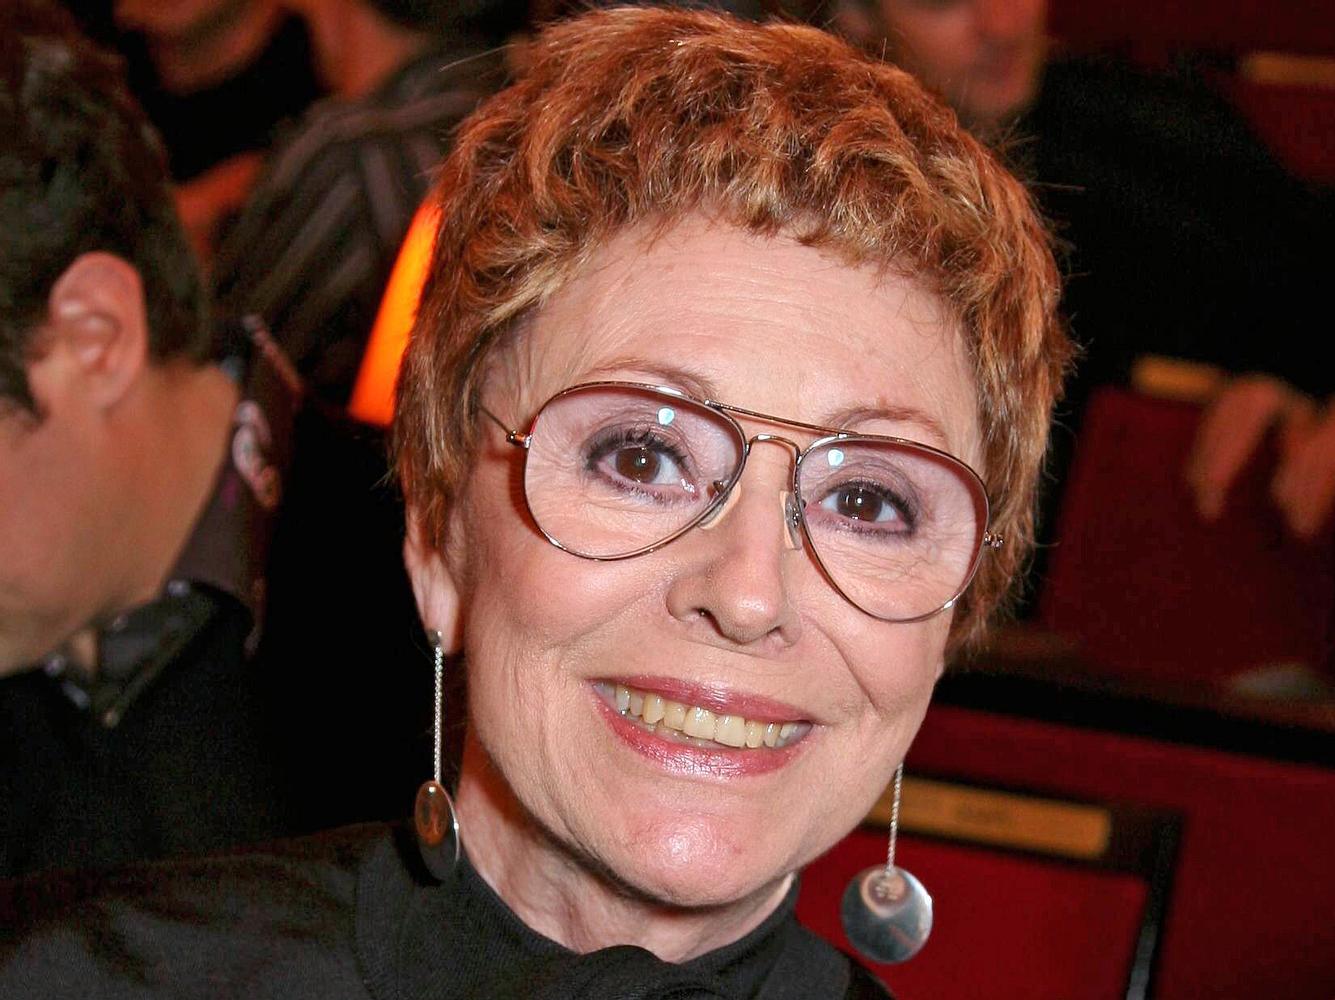 Caterina Valente im Jahr 2006.